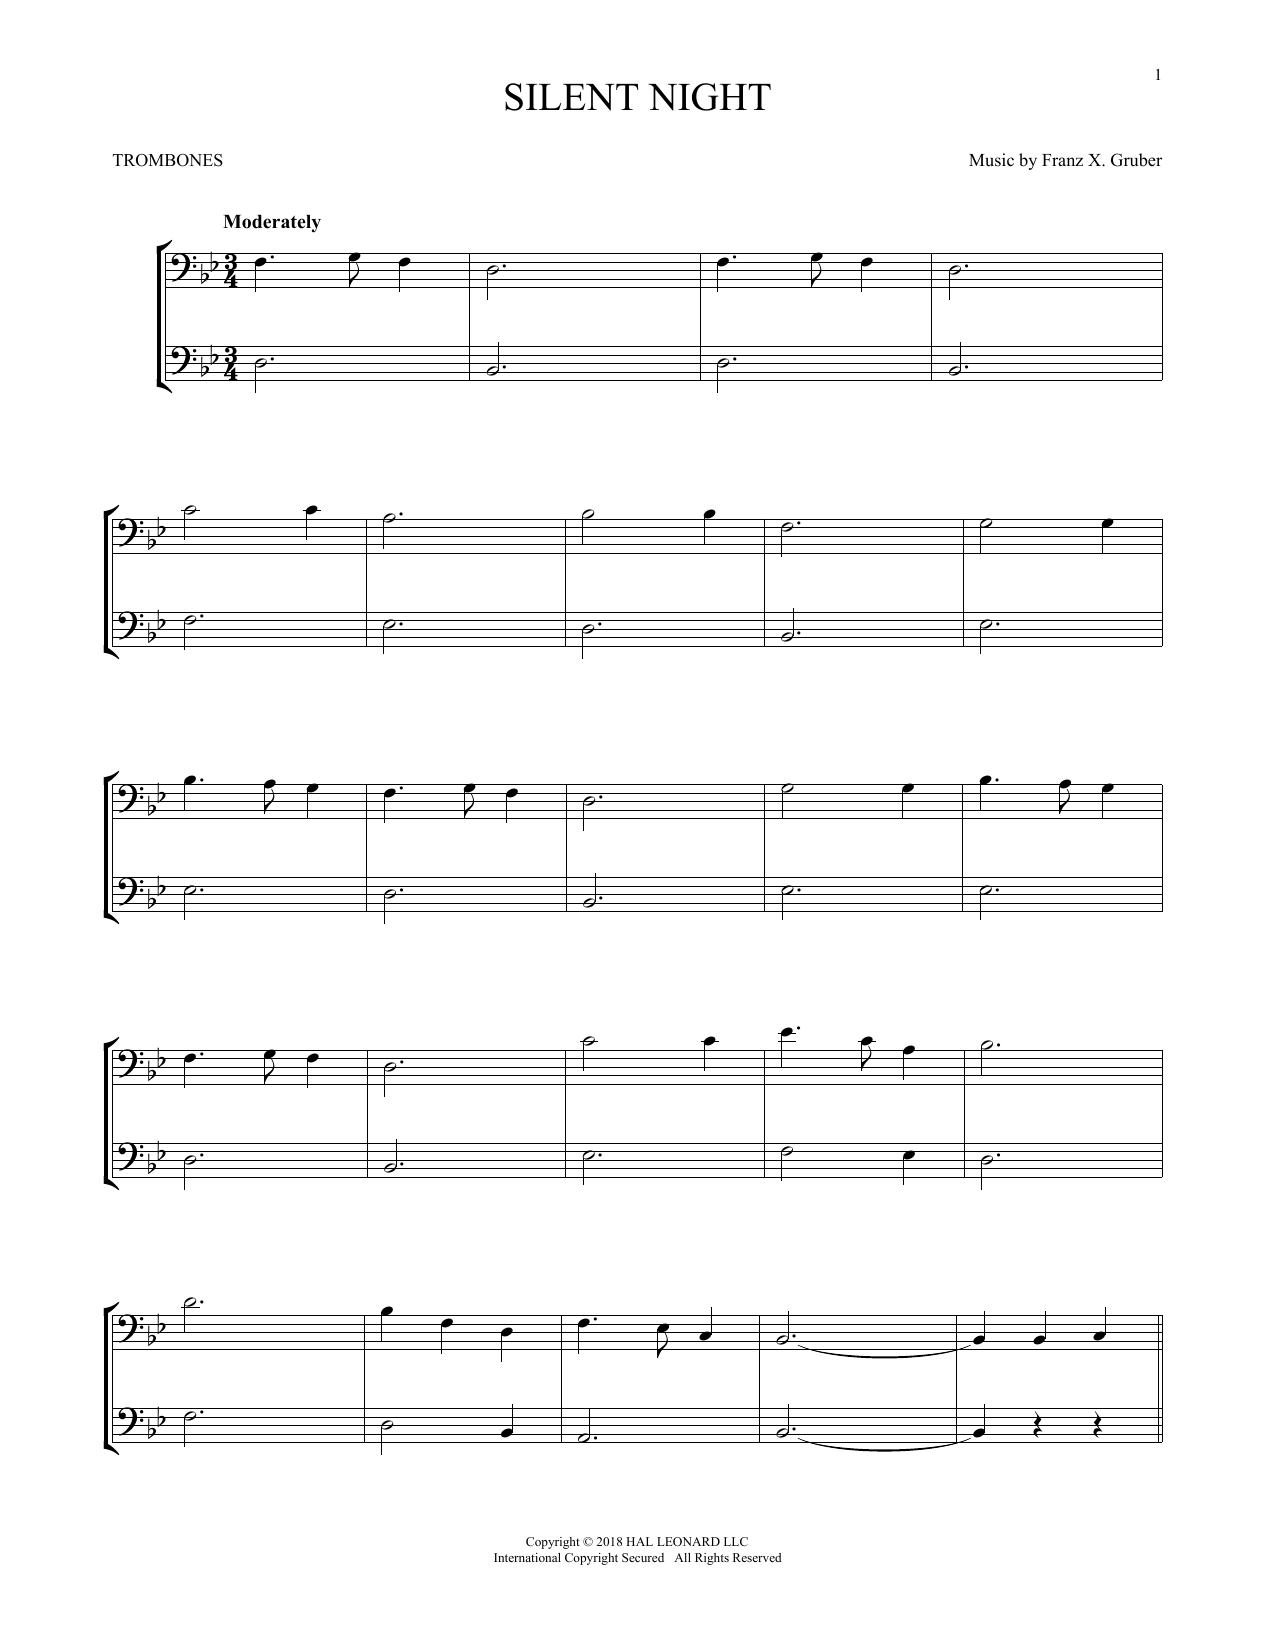 Silent Night (Trombone Transcription)